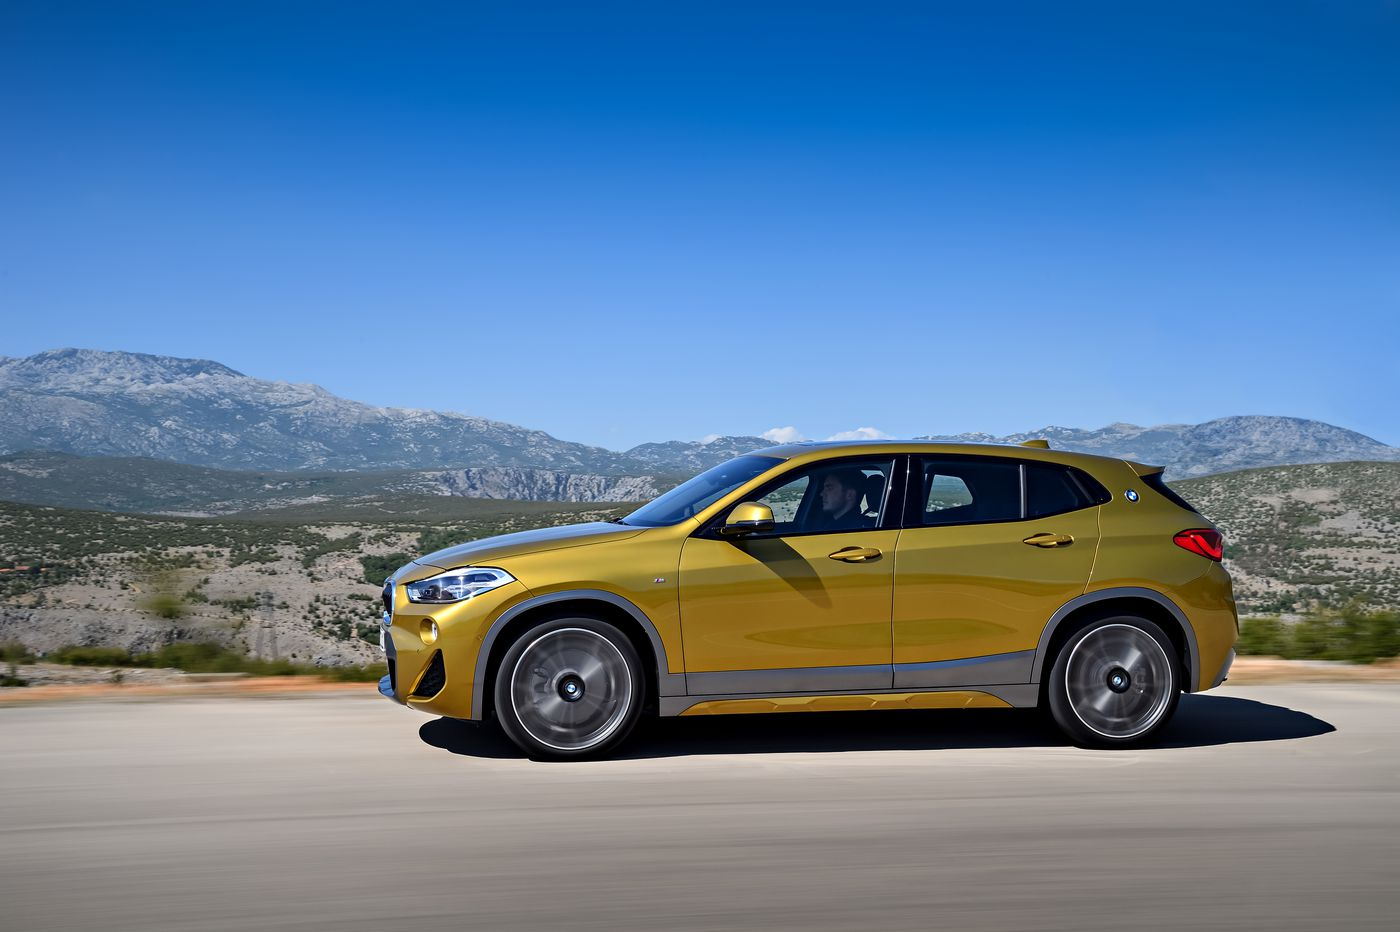 BMW X2 packs fun into a small package | Scott Sturgis